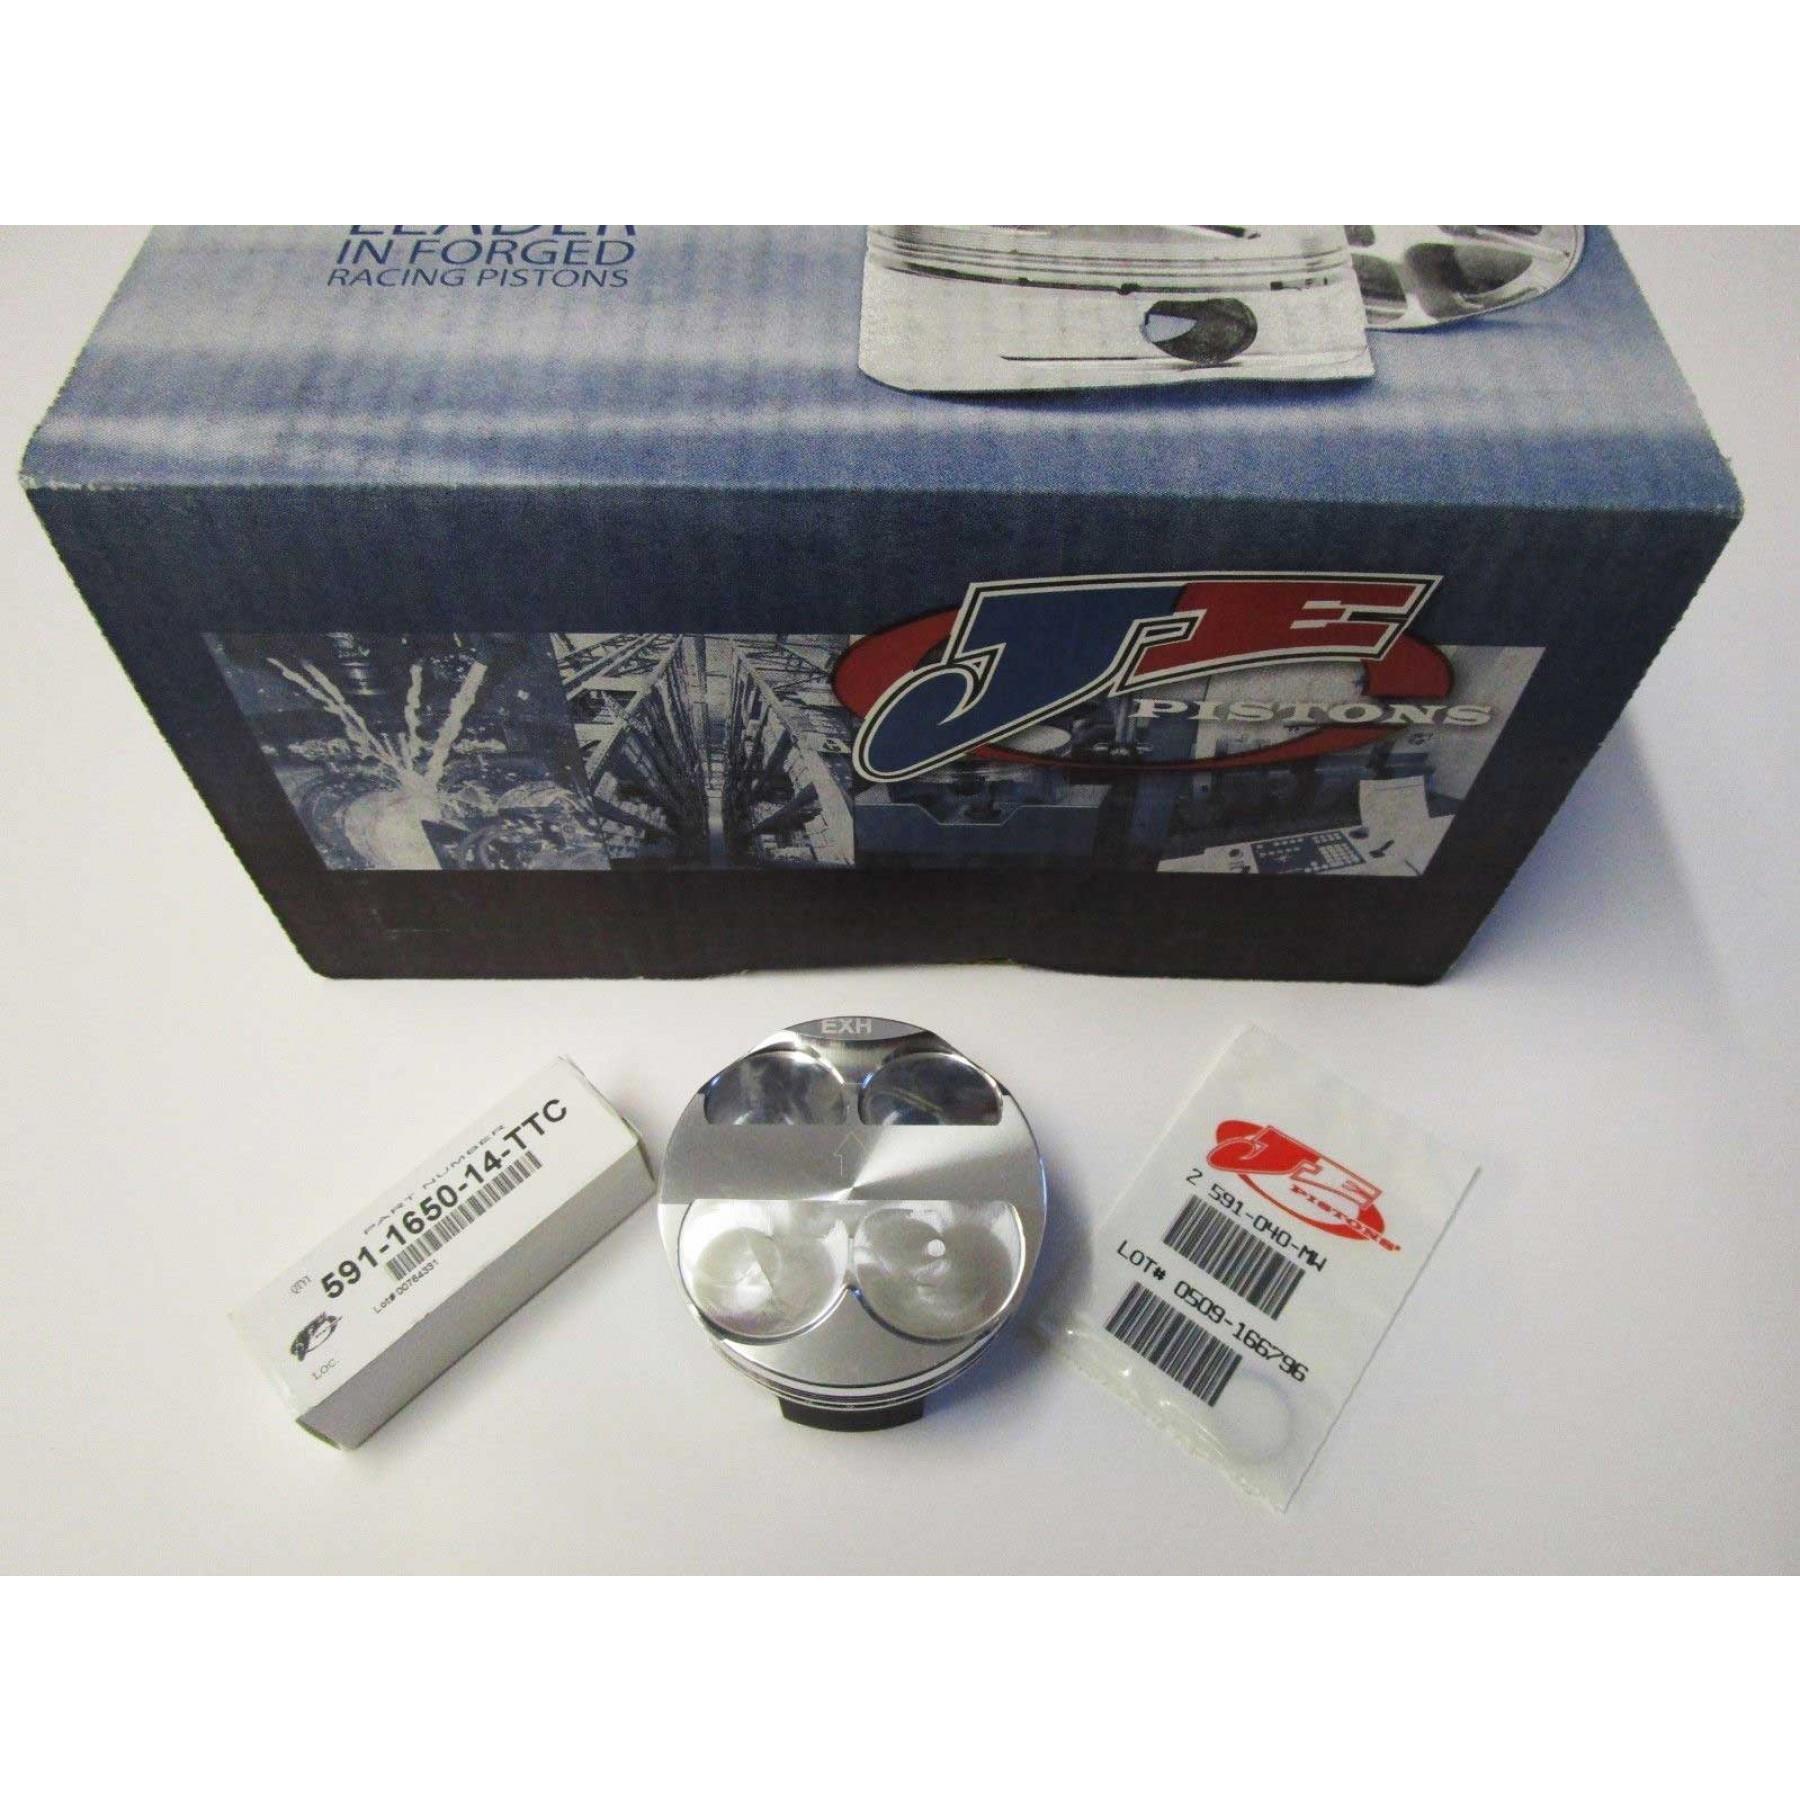 JE HC Racing forged piston kit for Suzuki GSXR1000 GSX-R1000 GSX-R 1000 K5 K6 K7 K8 2005-2008. Diameter : 73.40mm (Standard). High Compression Ratio : 13.8:1. Piston kit includes: Piston pin and Circlips. P/N: 247628S